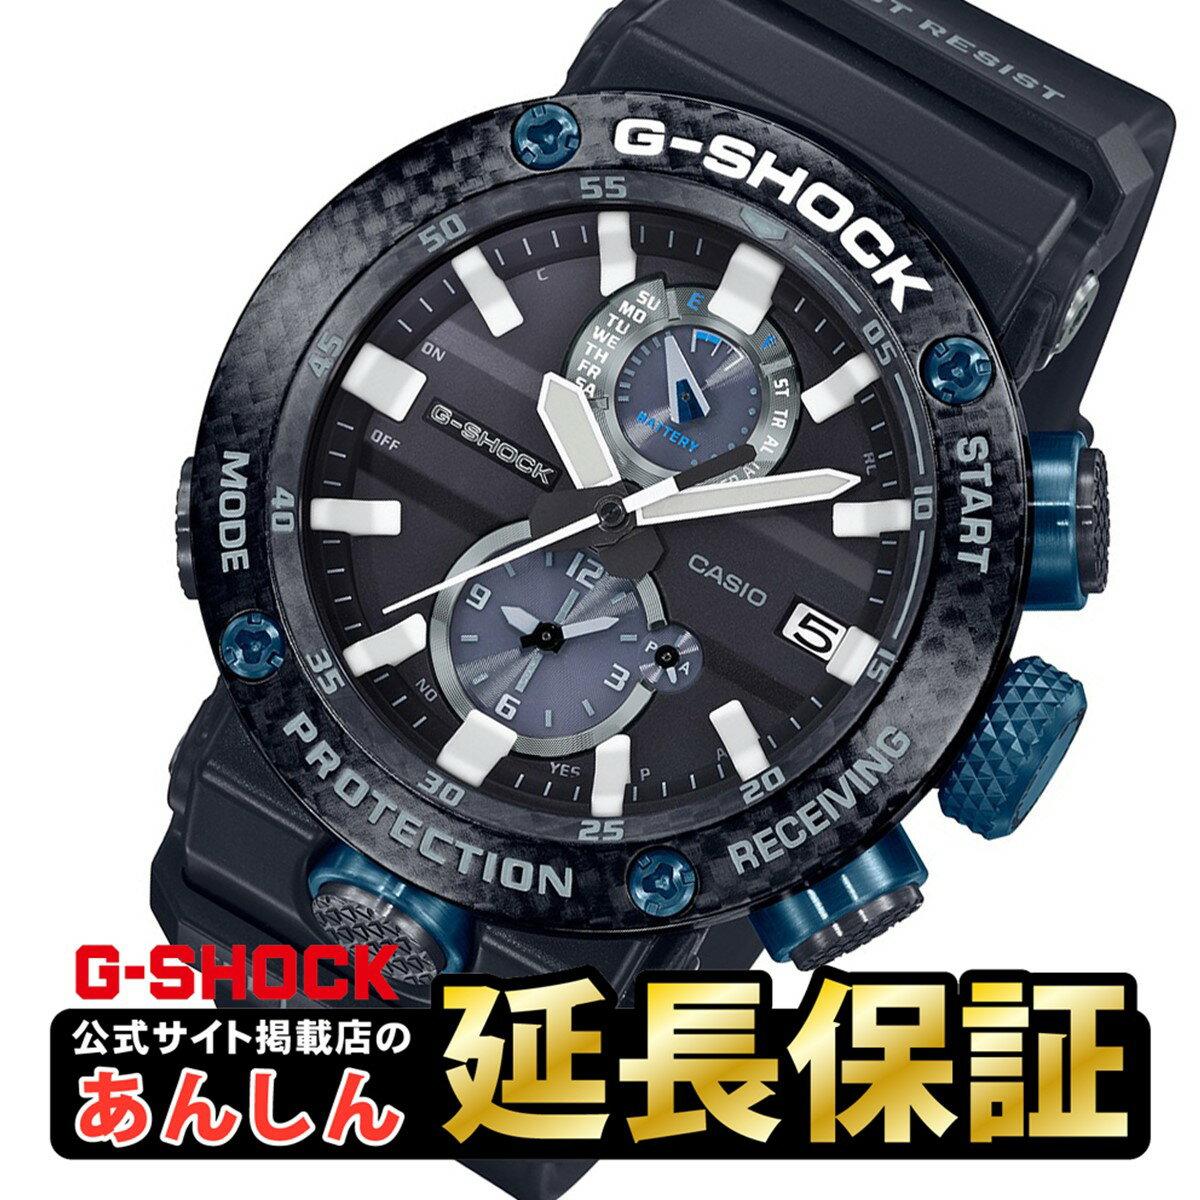 腕時計, メンズ腕時計  G GWR-B1000-1A1JF Bluetooth CASIO G-SHOCK G 031910spl